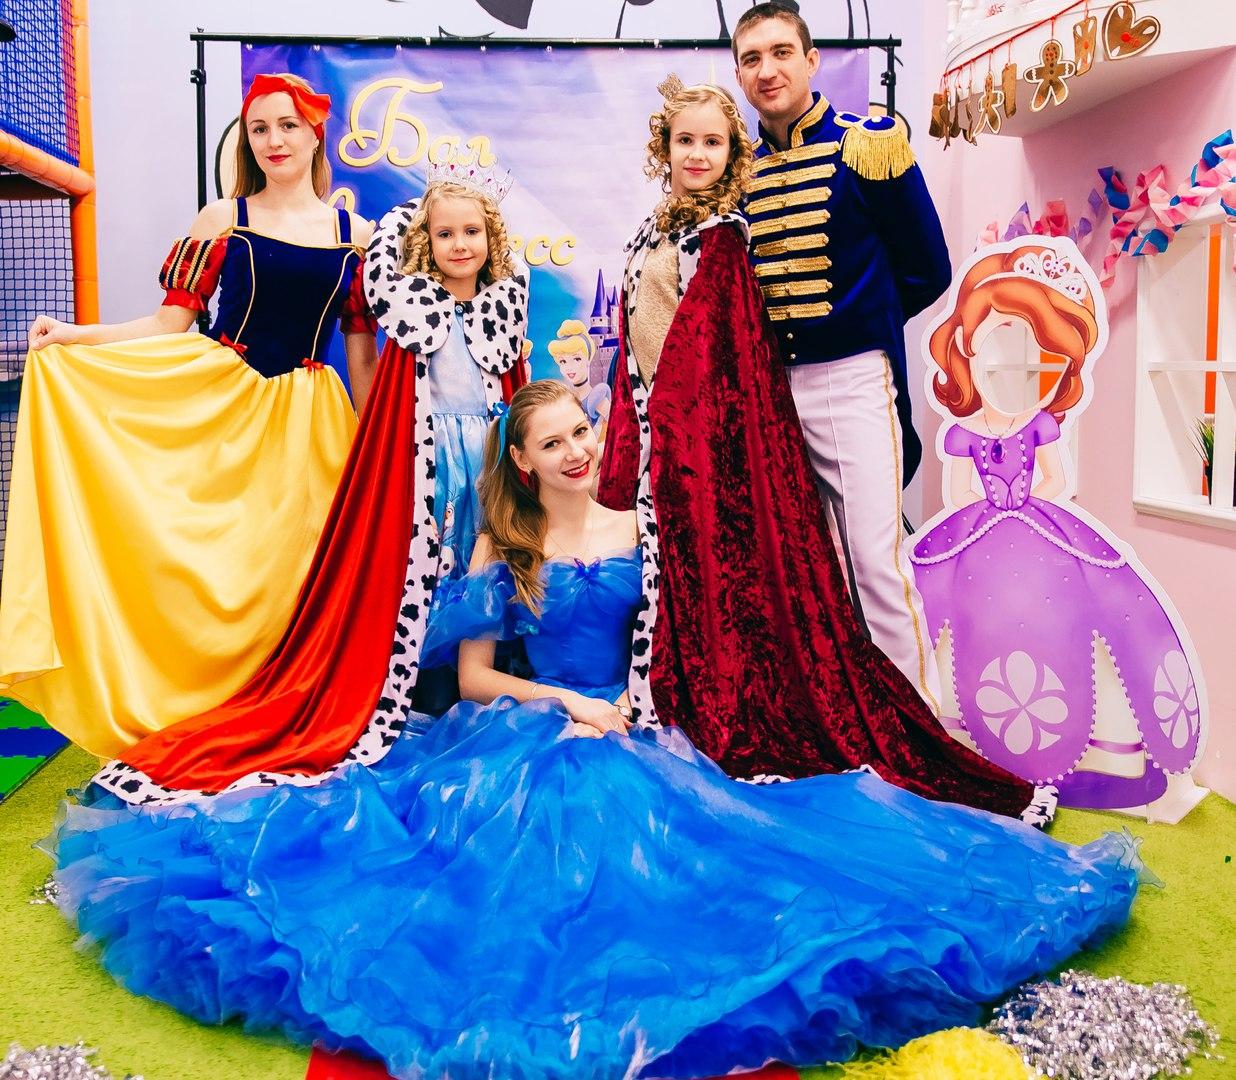 детский клуб в Калининграде sorry, бабушка -12